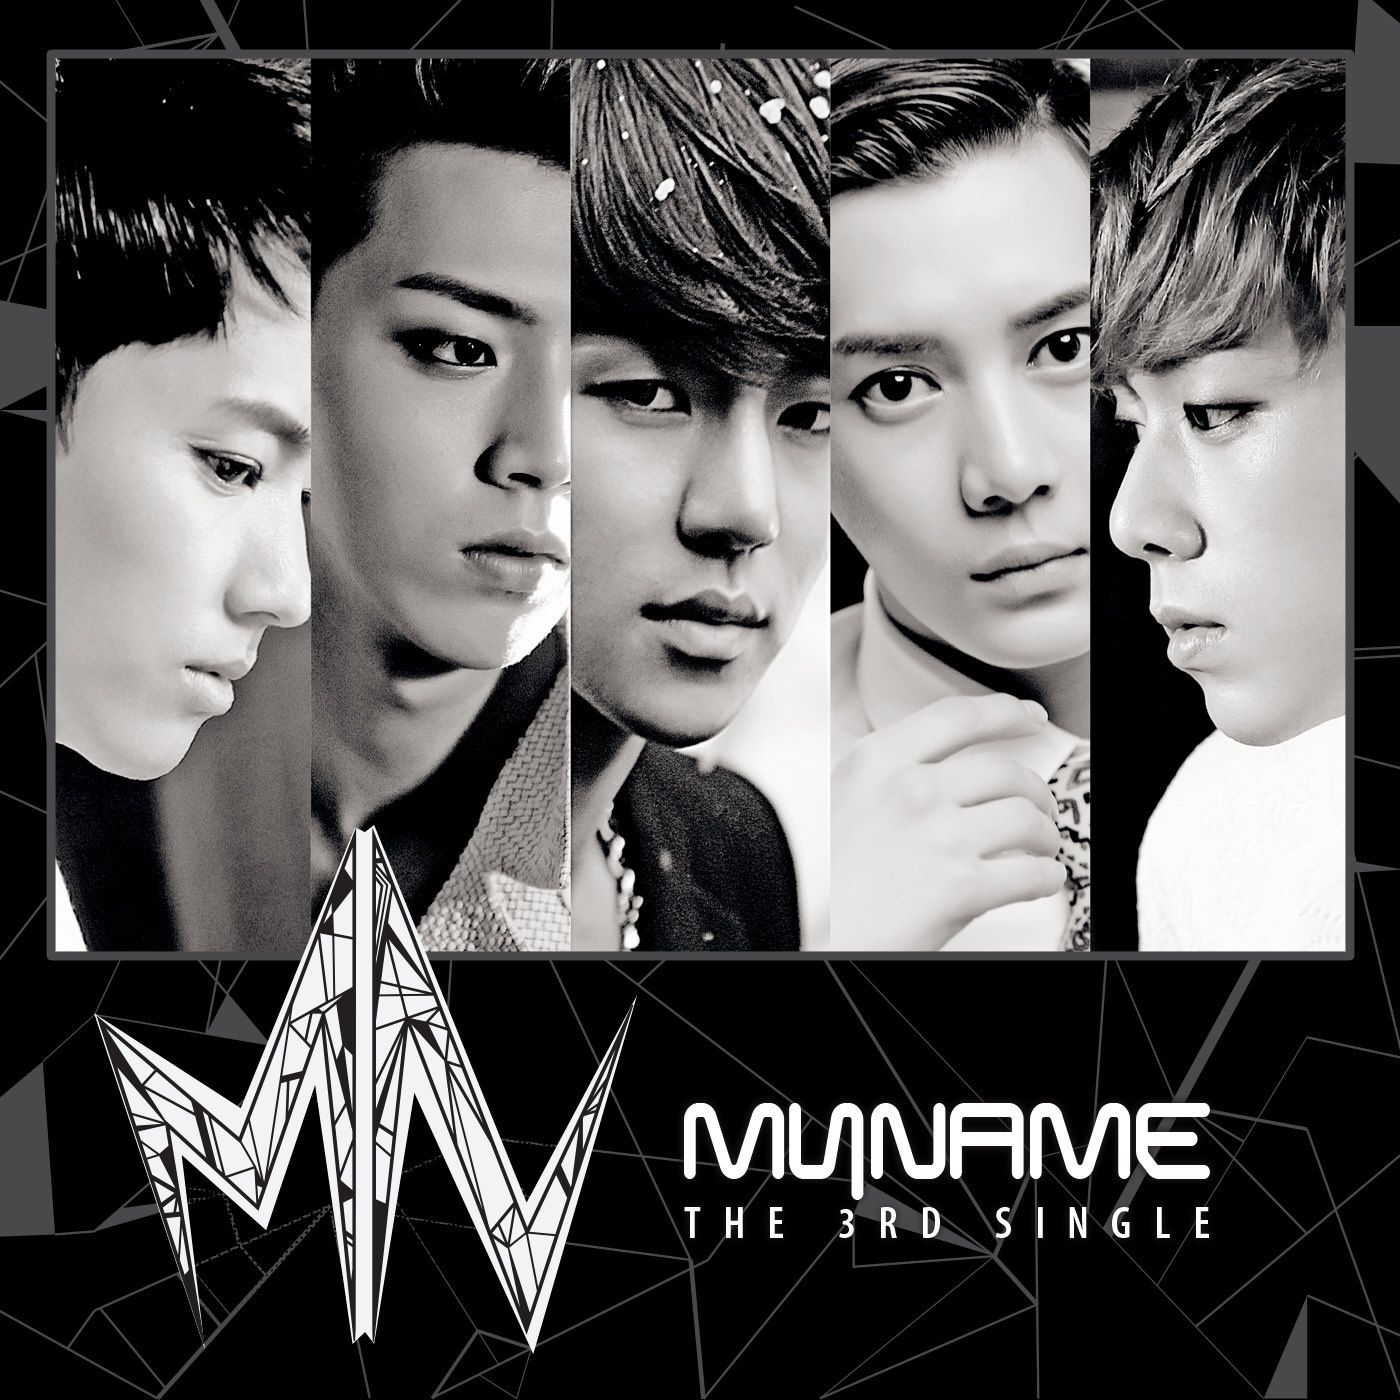 [Single] MYNAME - MYNAME 3rd Single Album